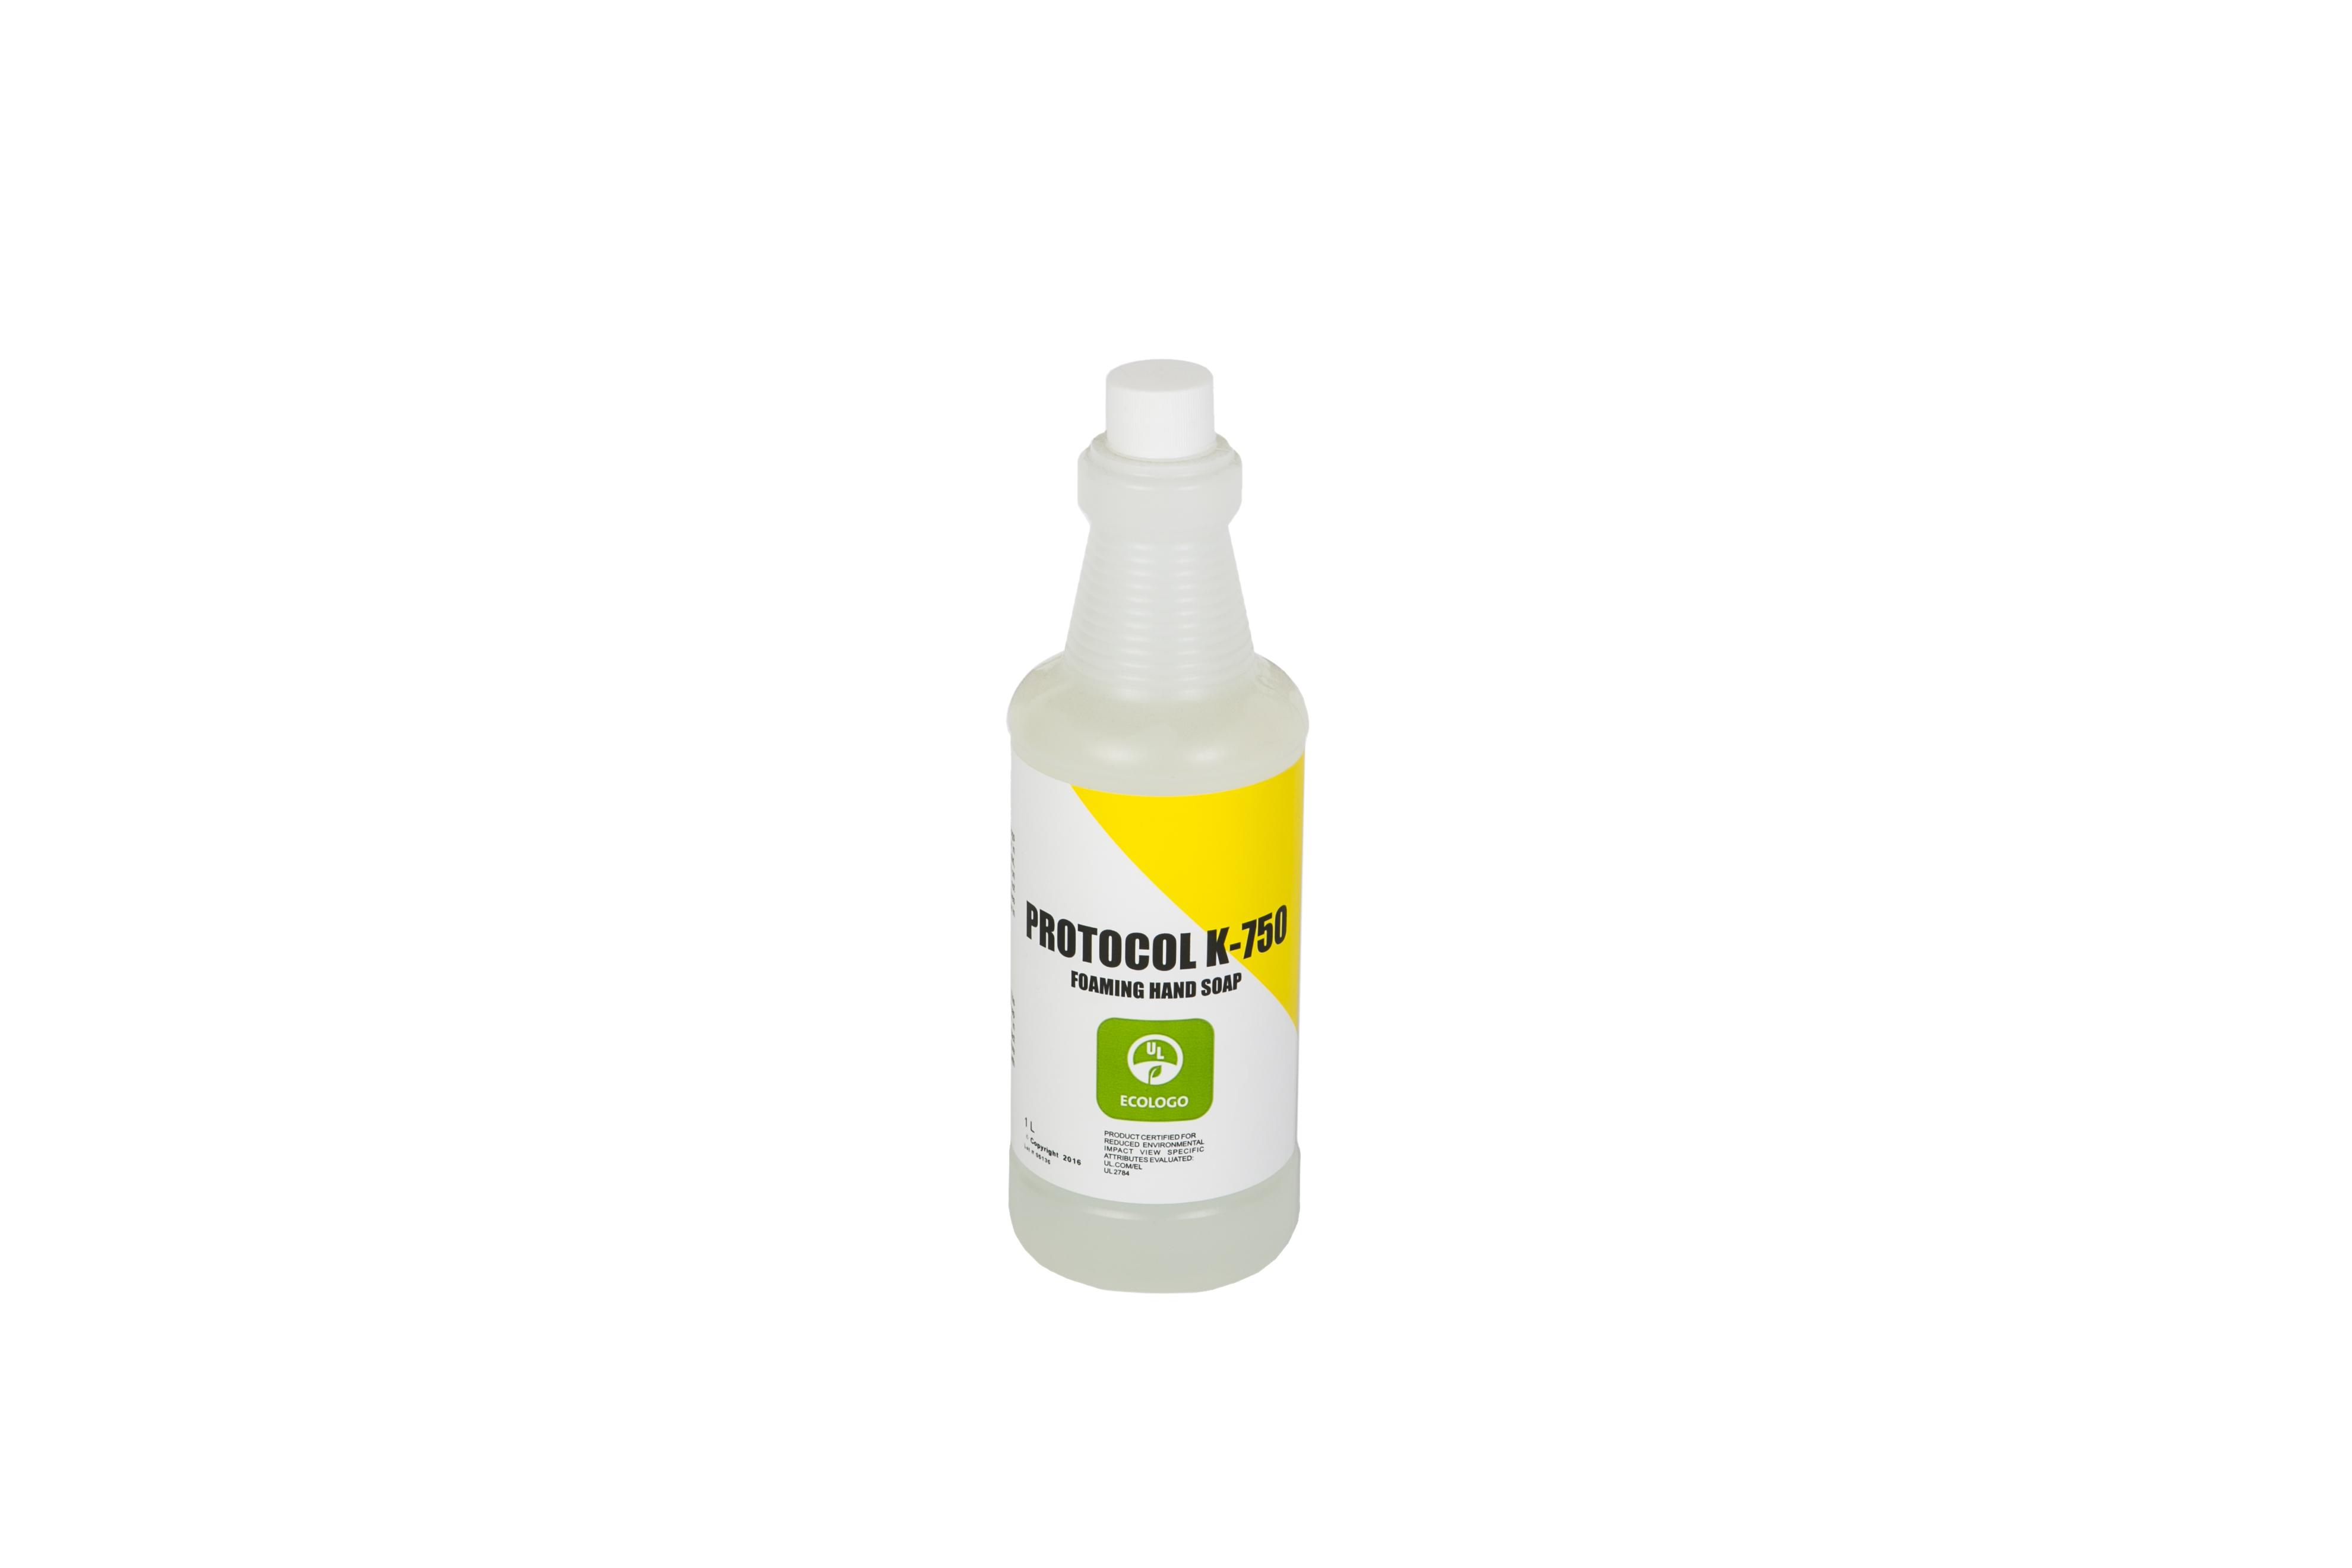 Protocol K-750 UL Eco Certified Foaming Hand Soap - 1 Litre